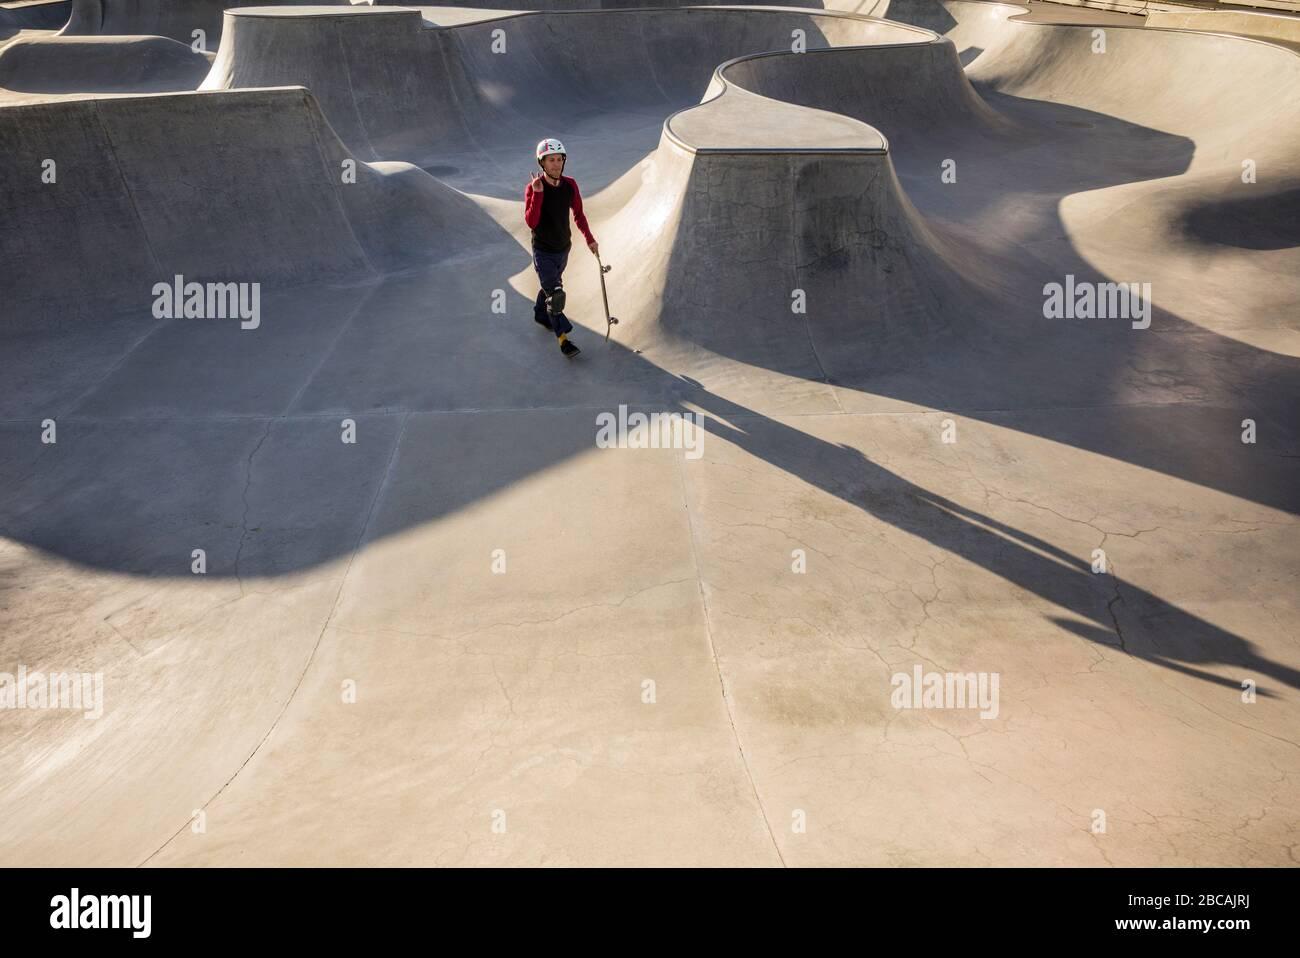 Suède, Scania, Malmo, région de Vastra Hamnen, skate Park avec skater, Banque D'Images